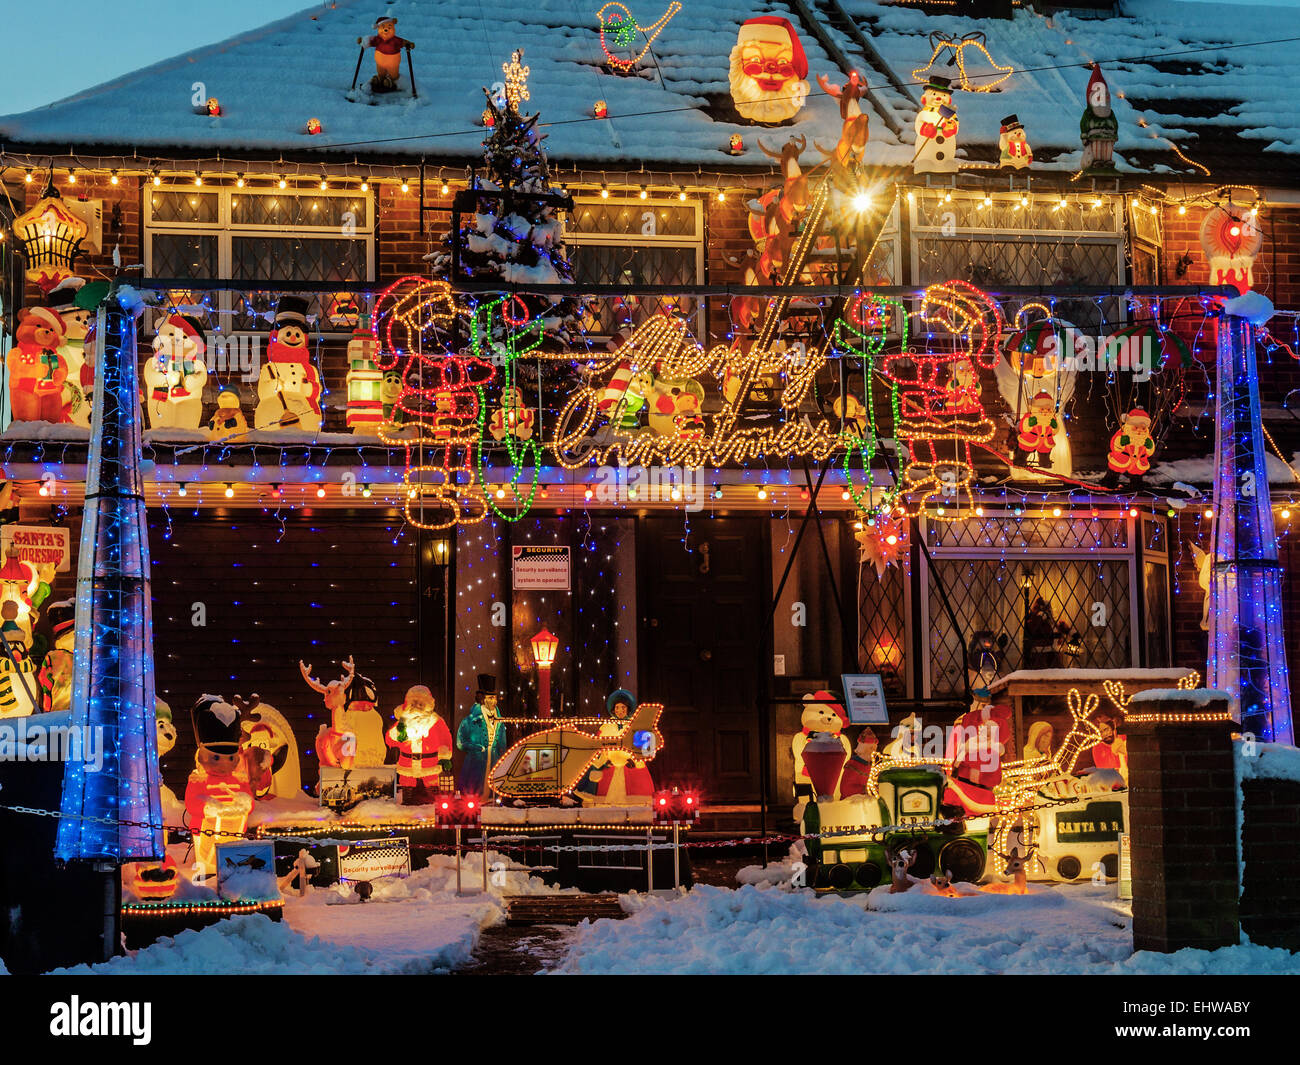 Christmas Decorations Berlkshire UK Stock Photo Royalty Free